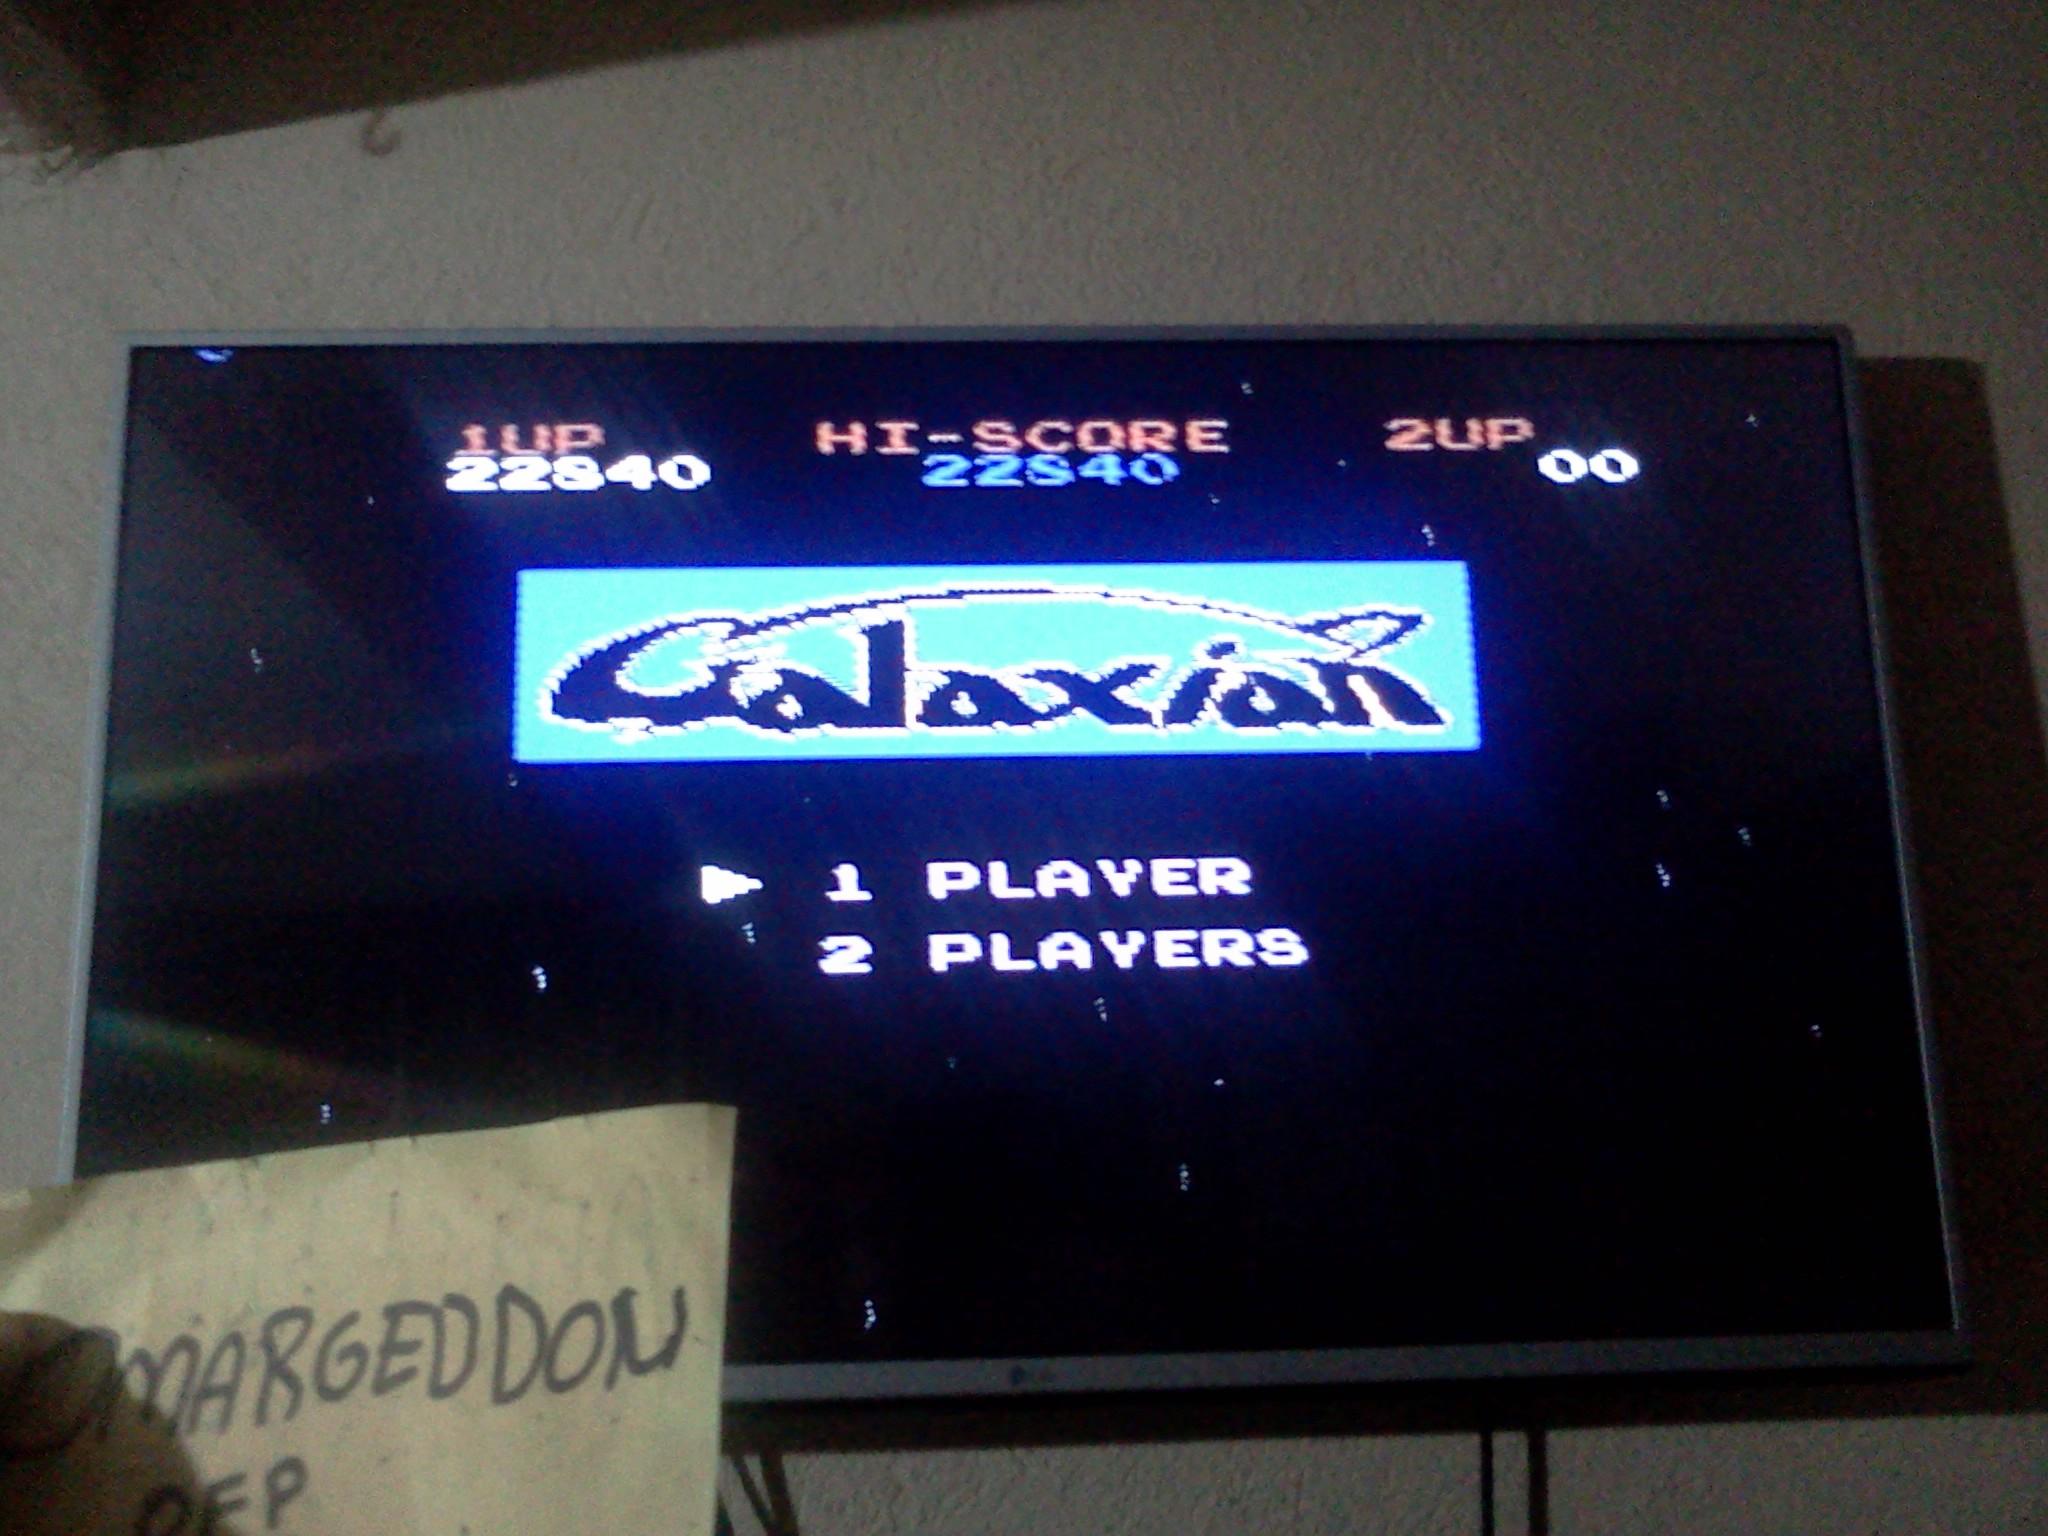 Galaxian 22,840 points